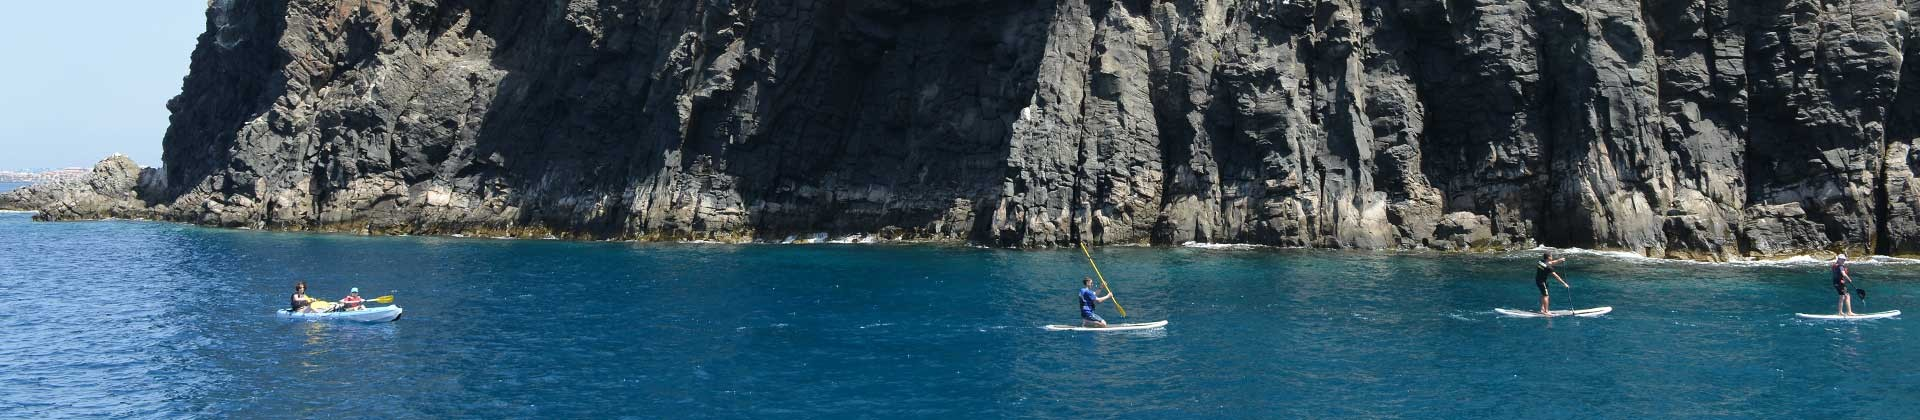 https://www.goodmorningtenerife.com/wp-content/uploads/2014/08/01_slide_sea_GM_Tenerife-1920x420.jpg